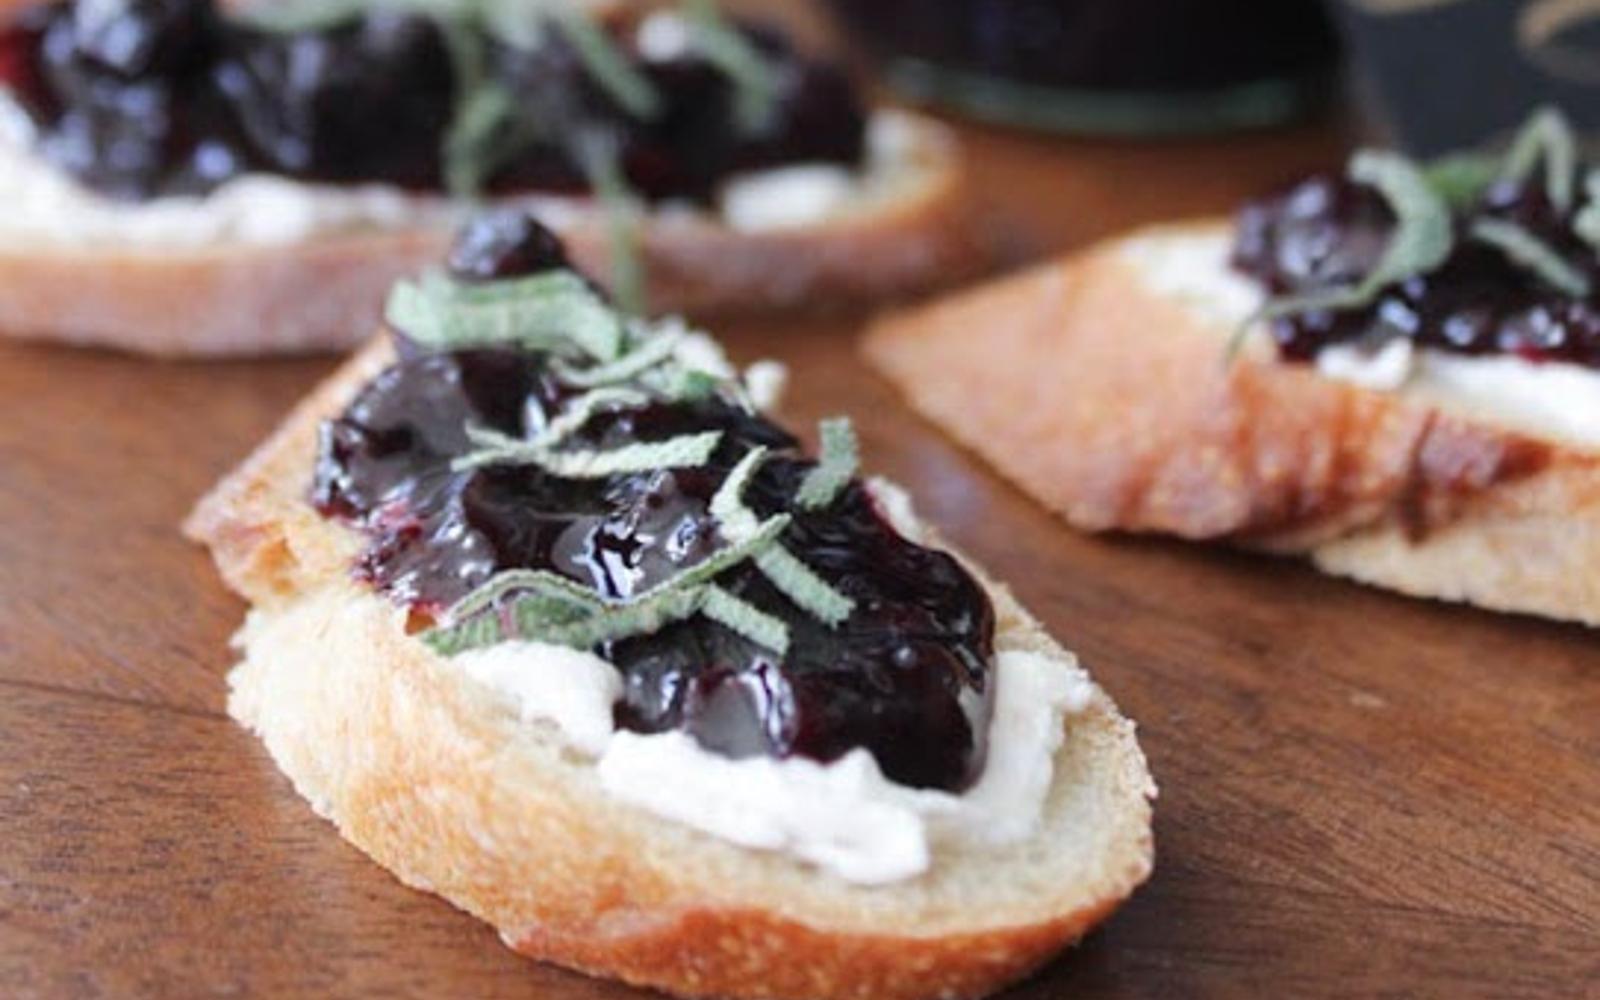 Blueberry Sage Chutney [Vegan, Gluten-Free]